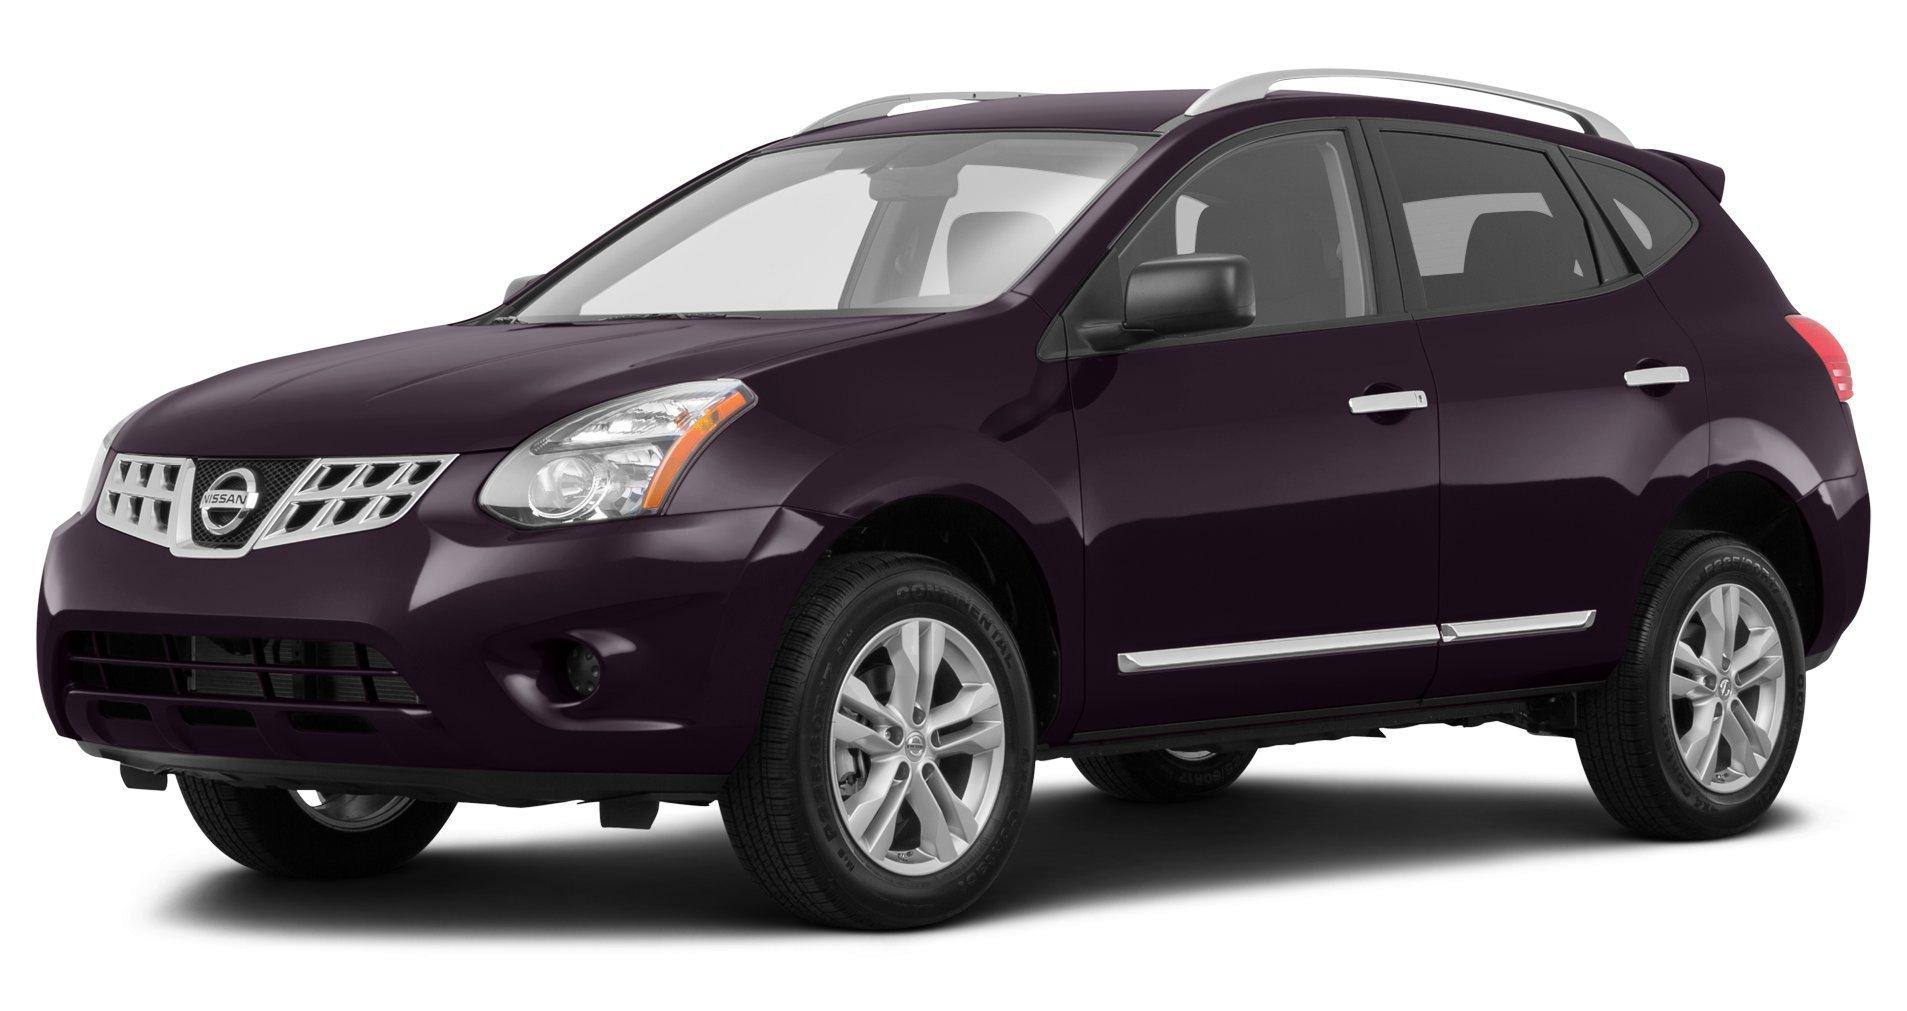 Nissan Rogue Select >> Amazon.com: 2015 Nissan Rogue Select Reviews, Images, and